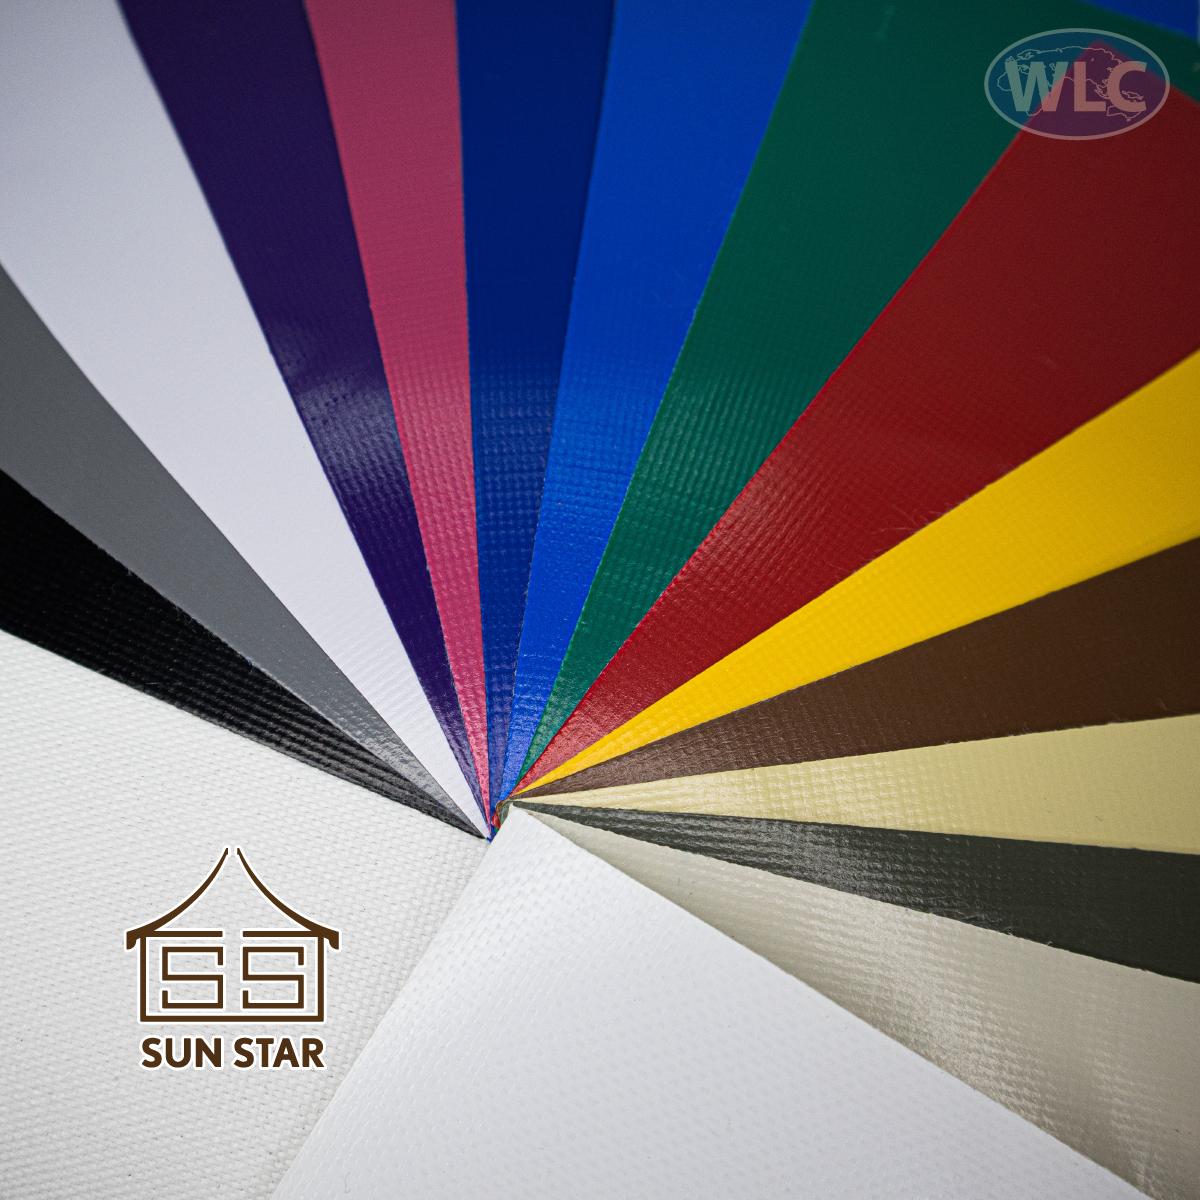 PVC Coated Tent Sunstar